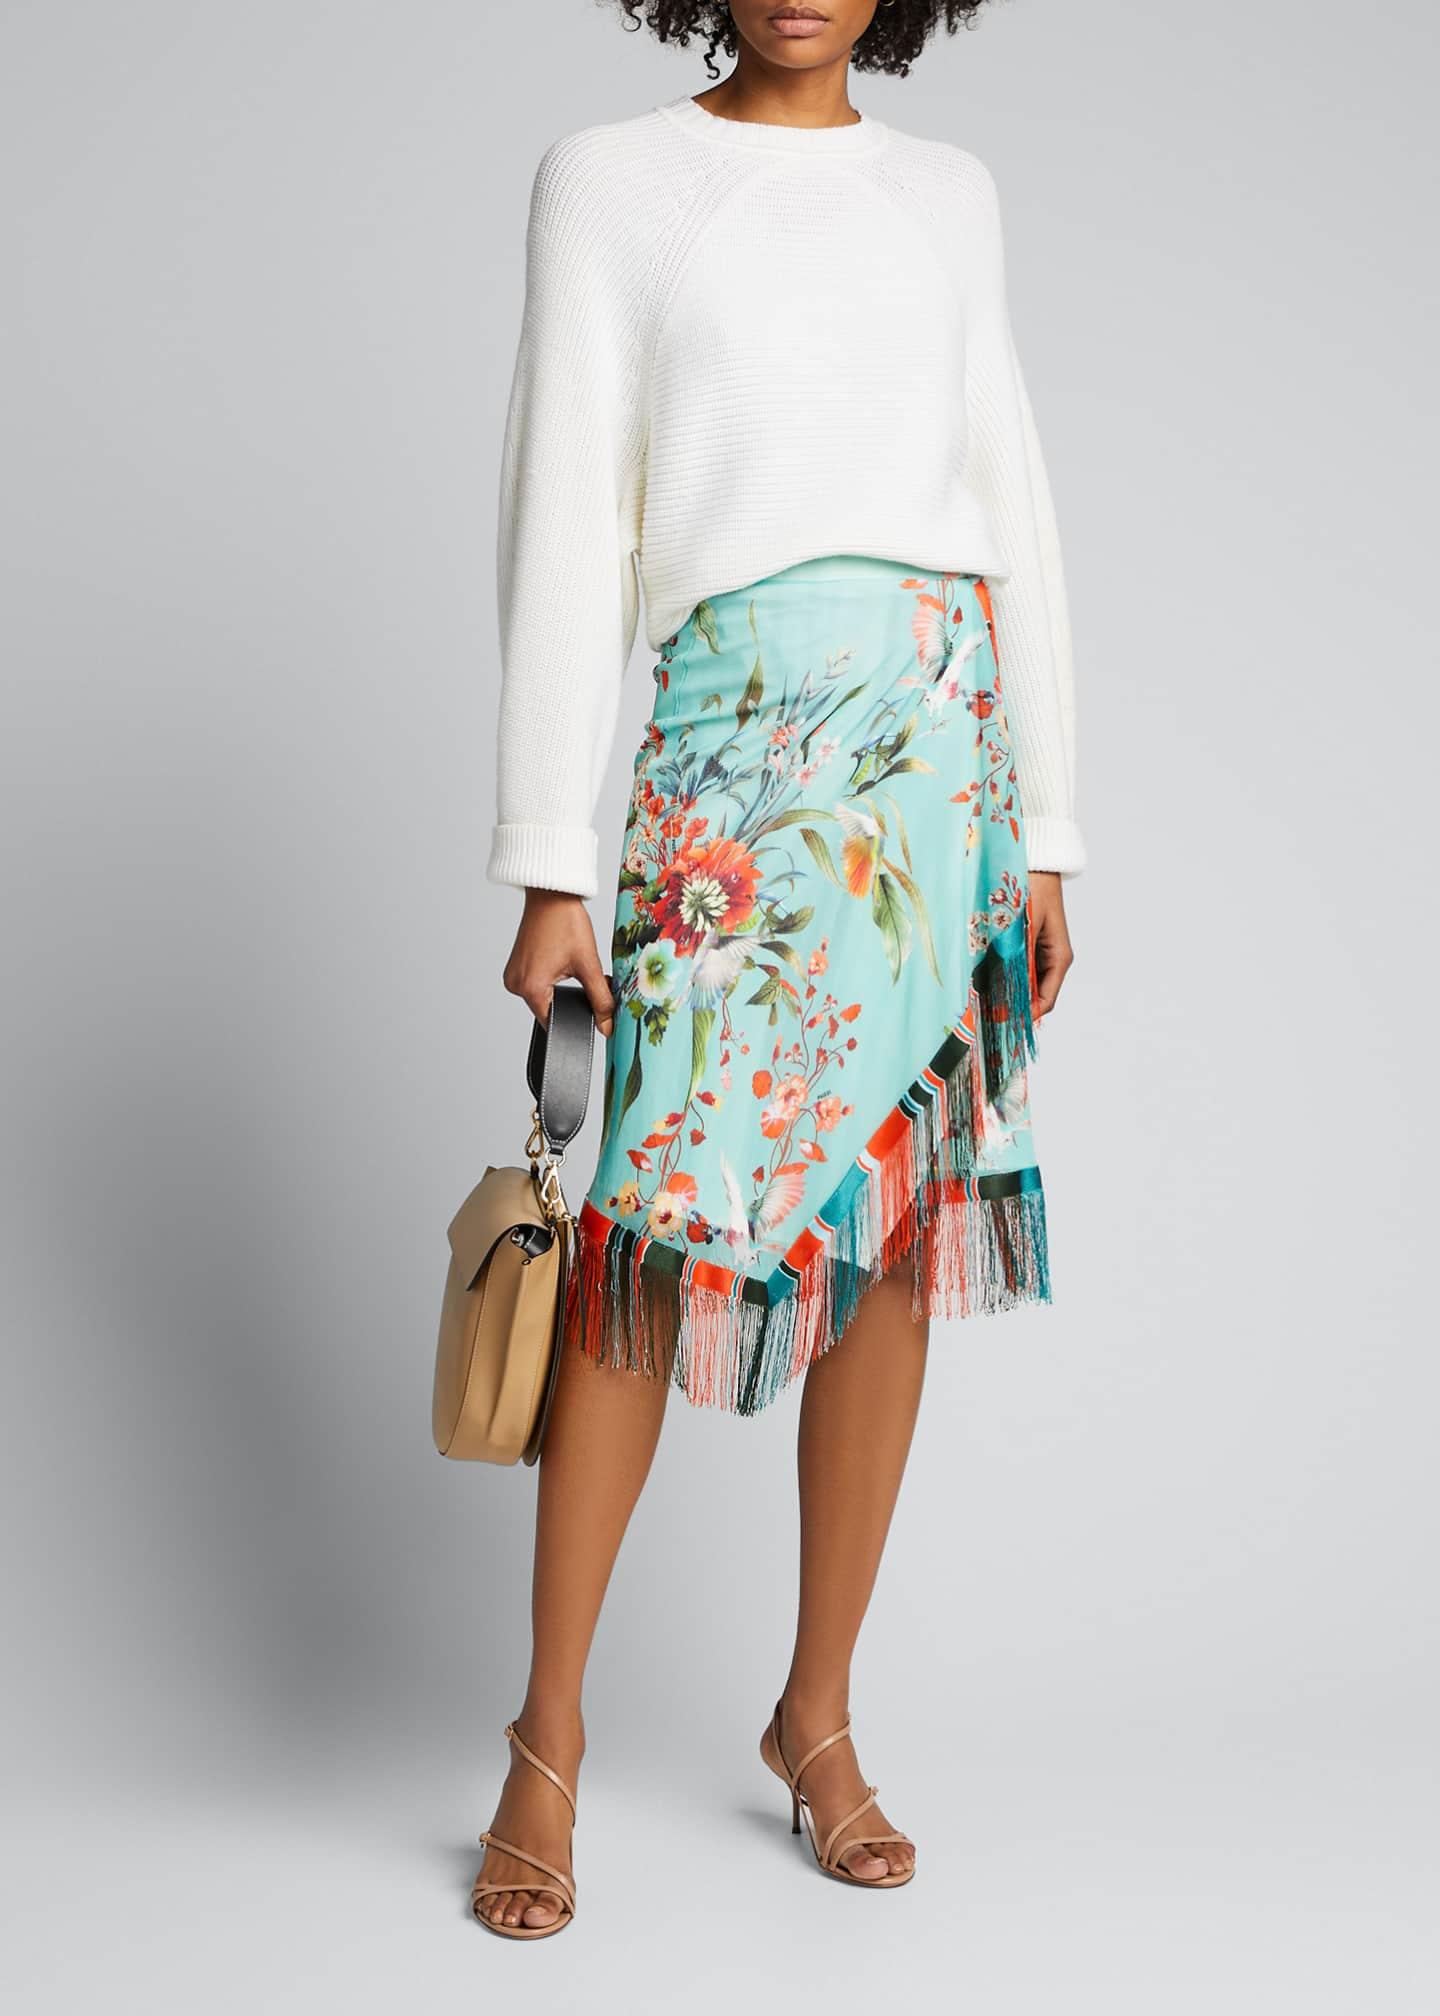 Fuzzi Floral Print Asymmetrical Fringe Skirt